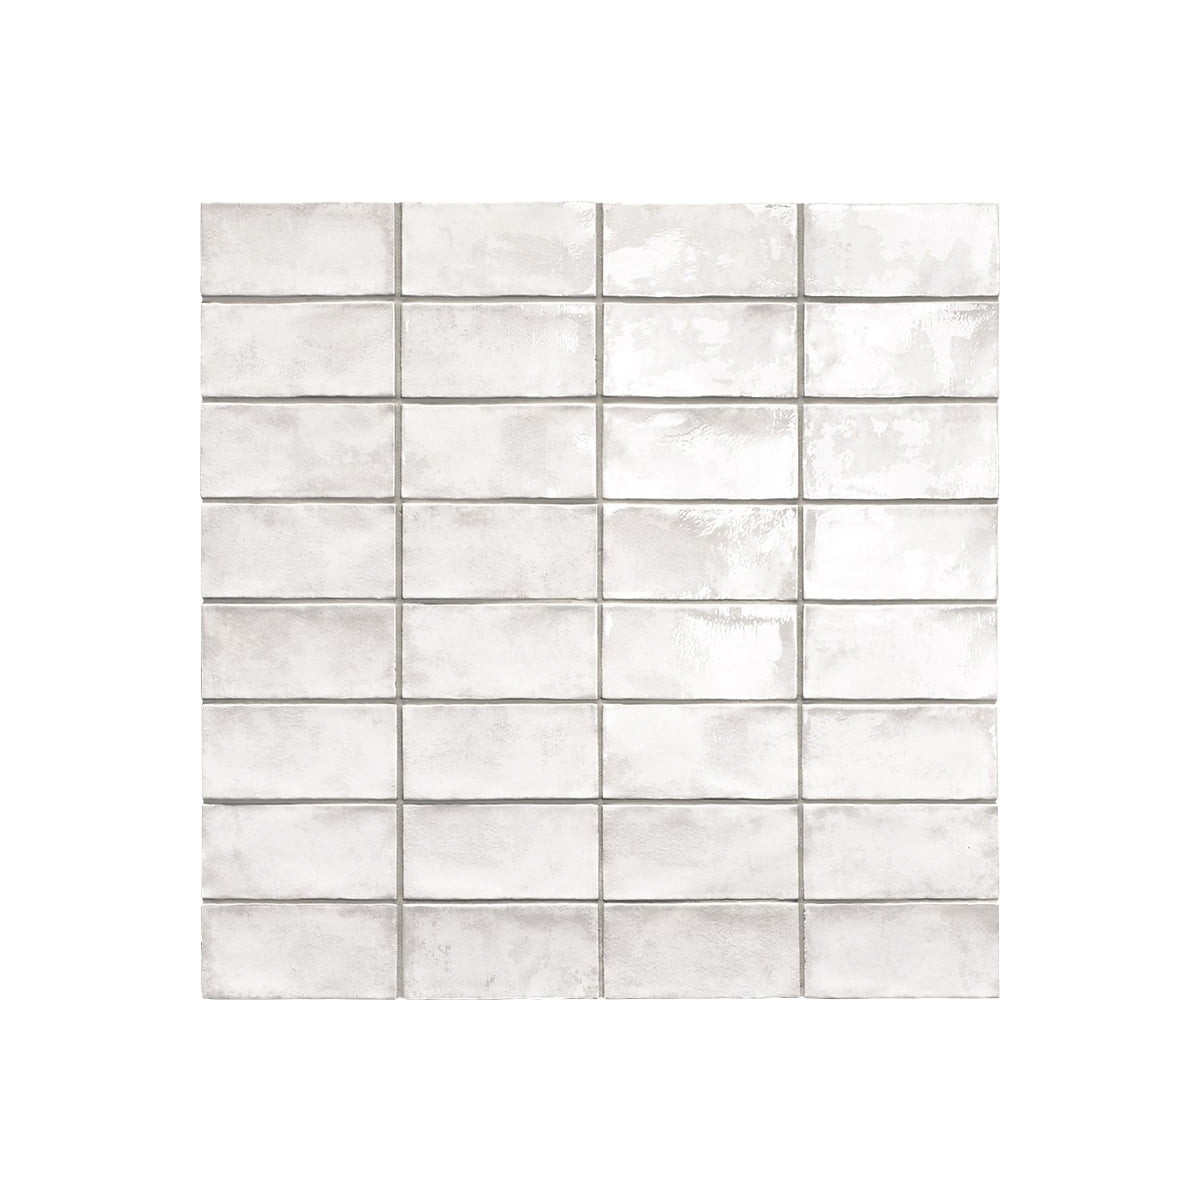 Biarritz Blanco 7.5x15 (caja)